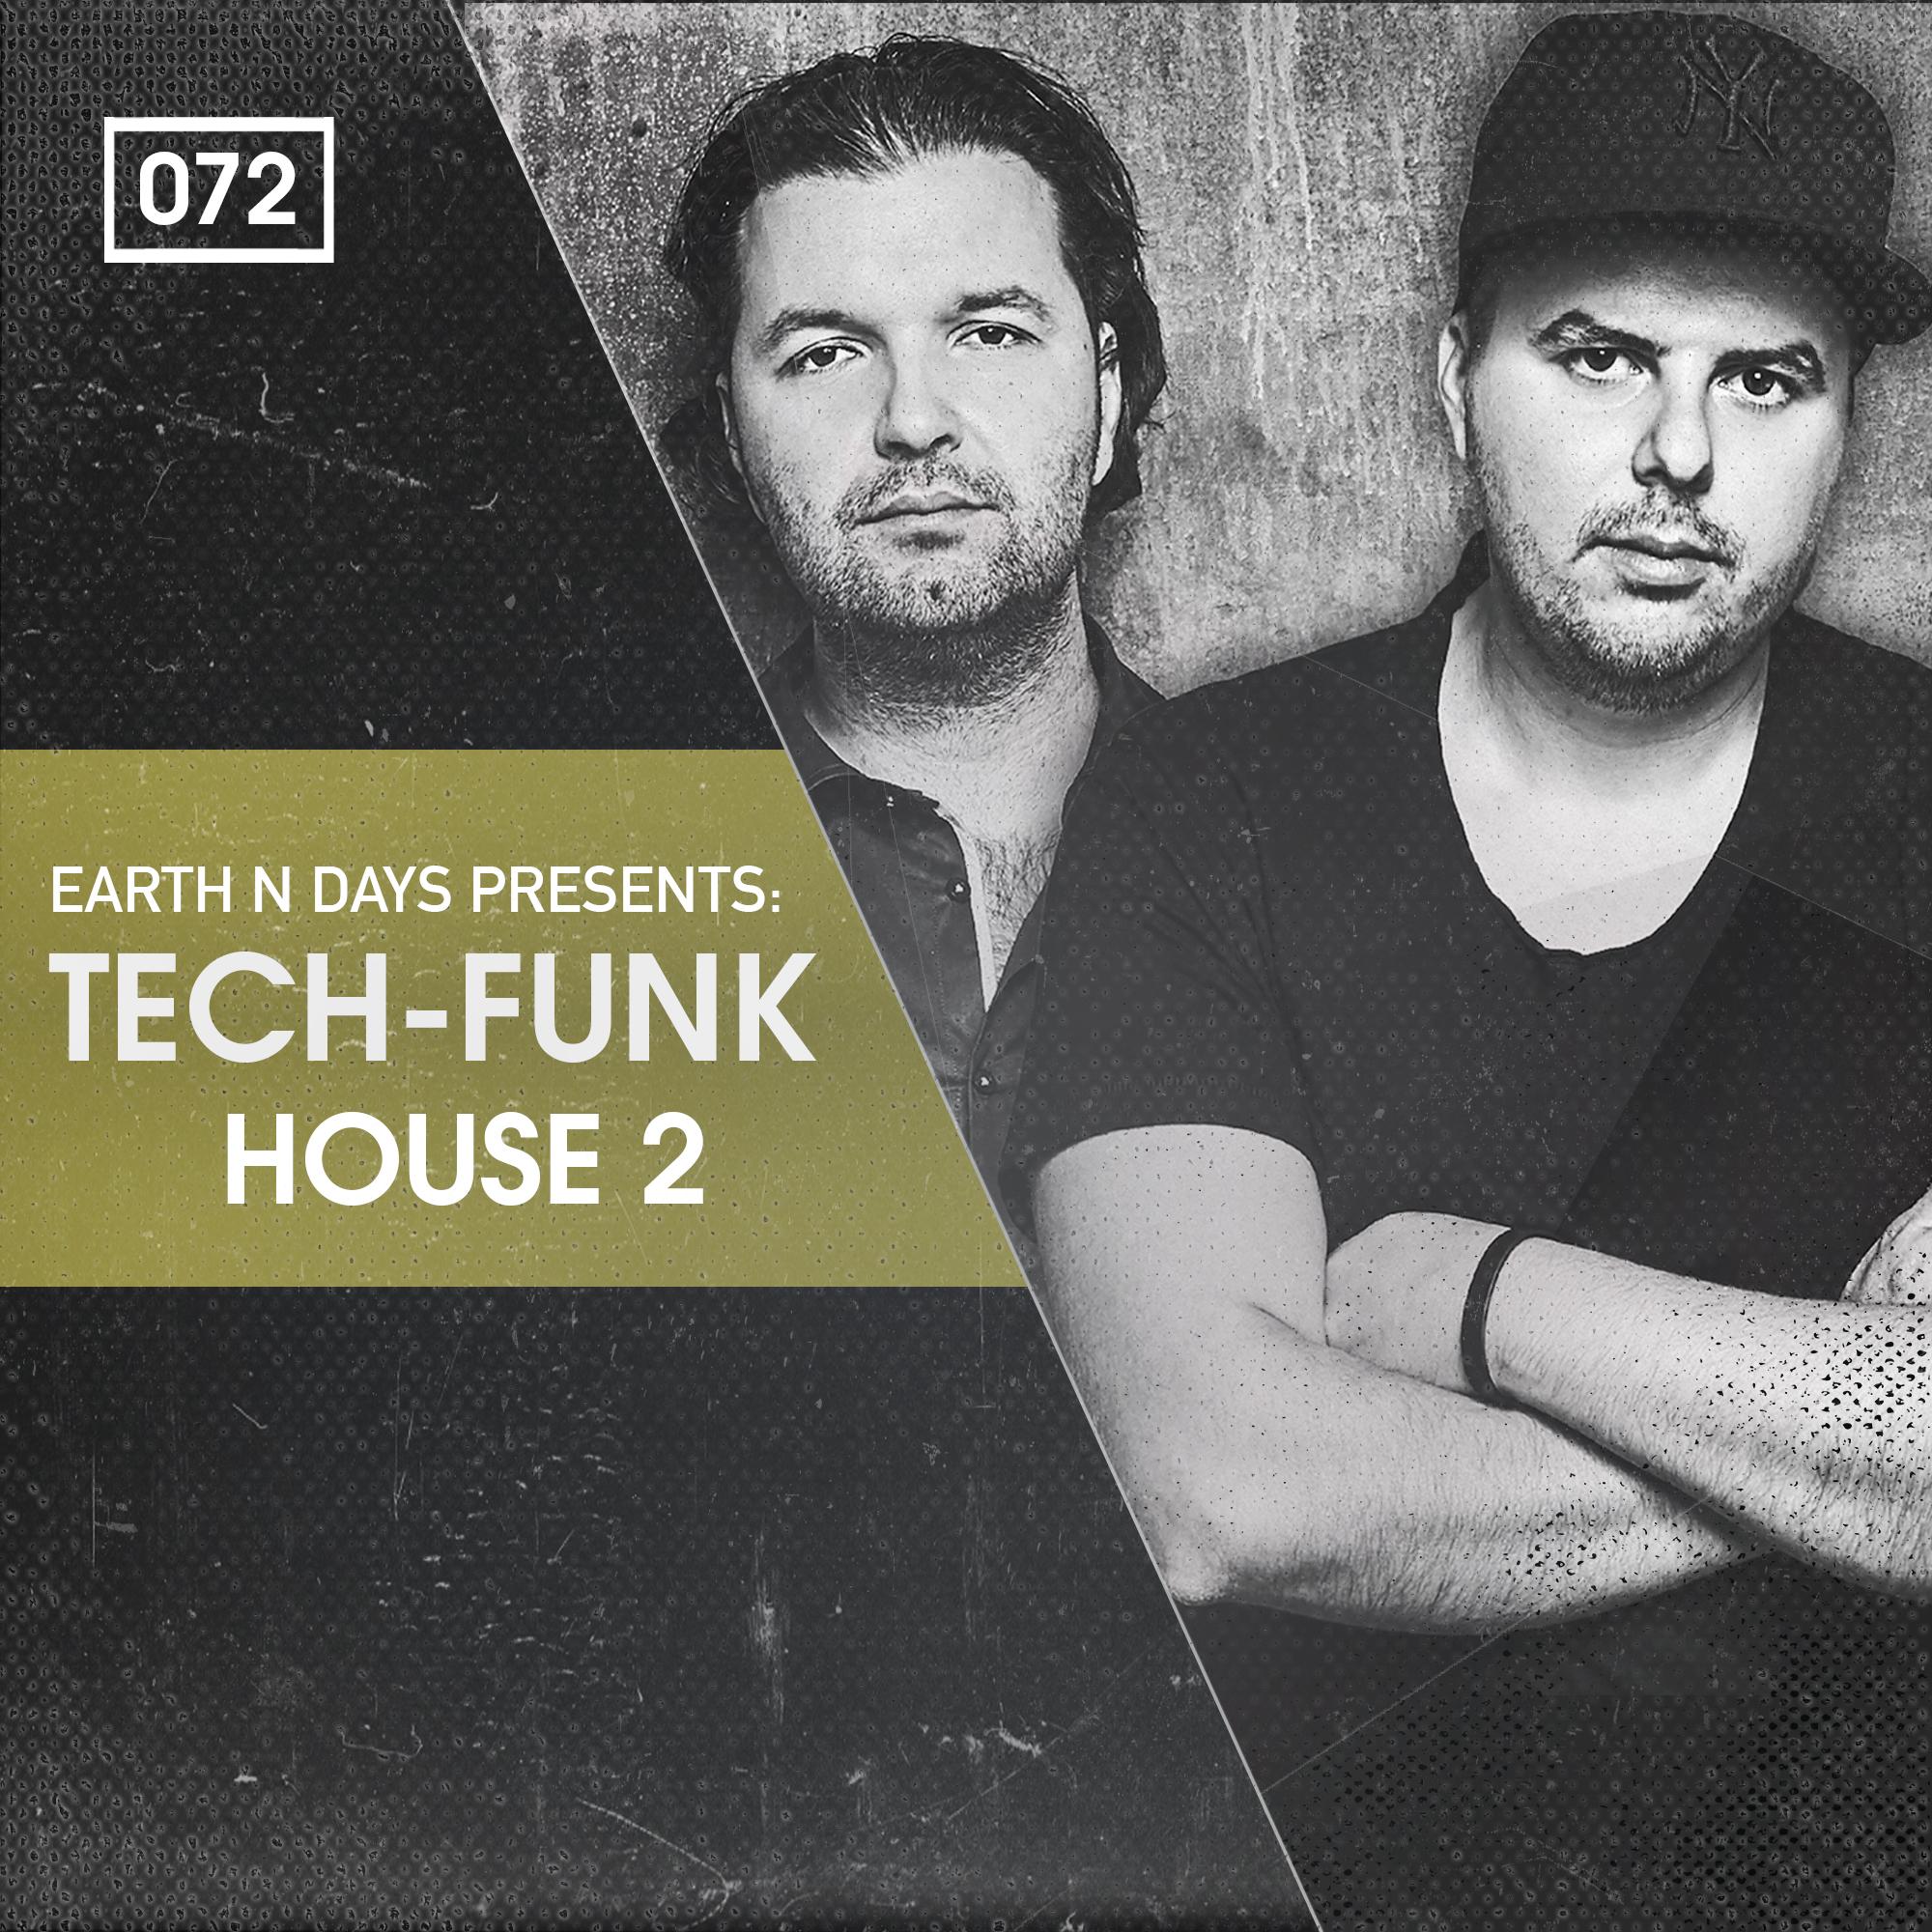 Bingoshakerz Tech-Funk House 2 by Earth n Days